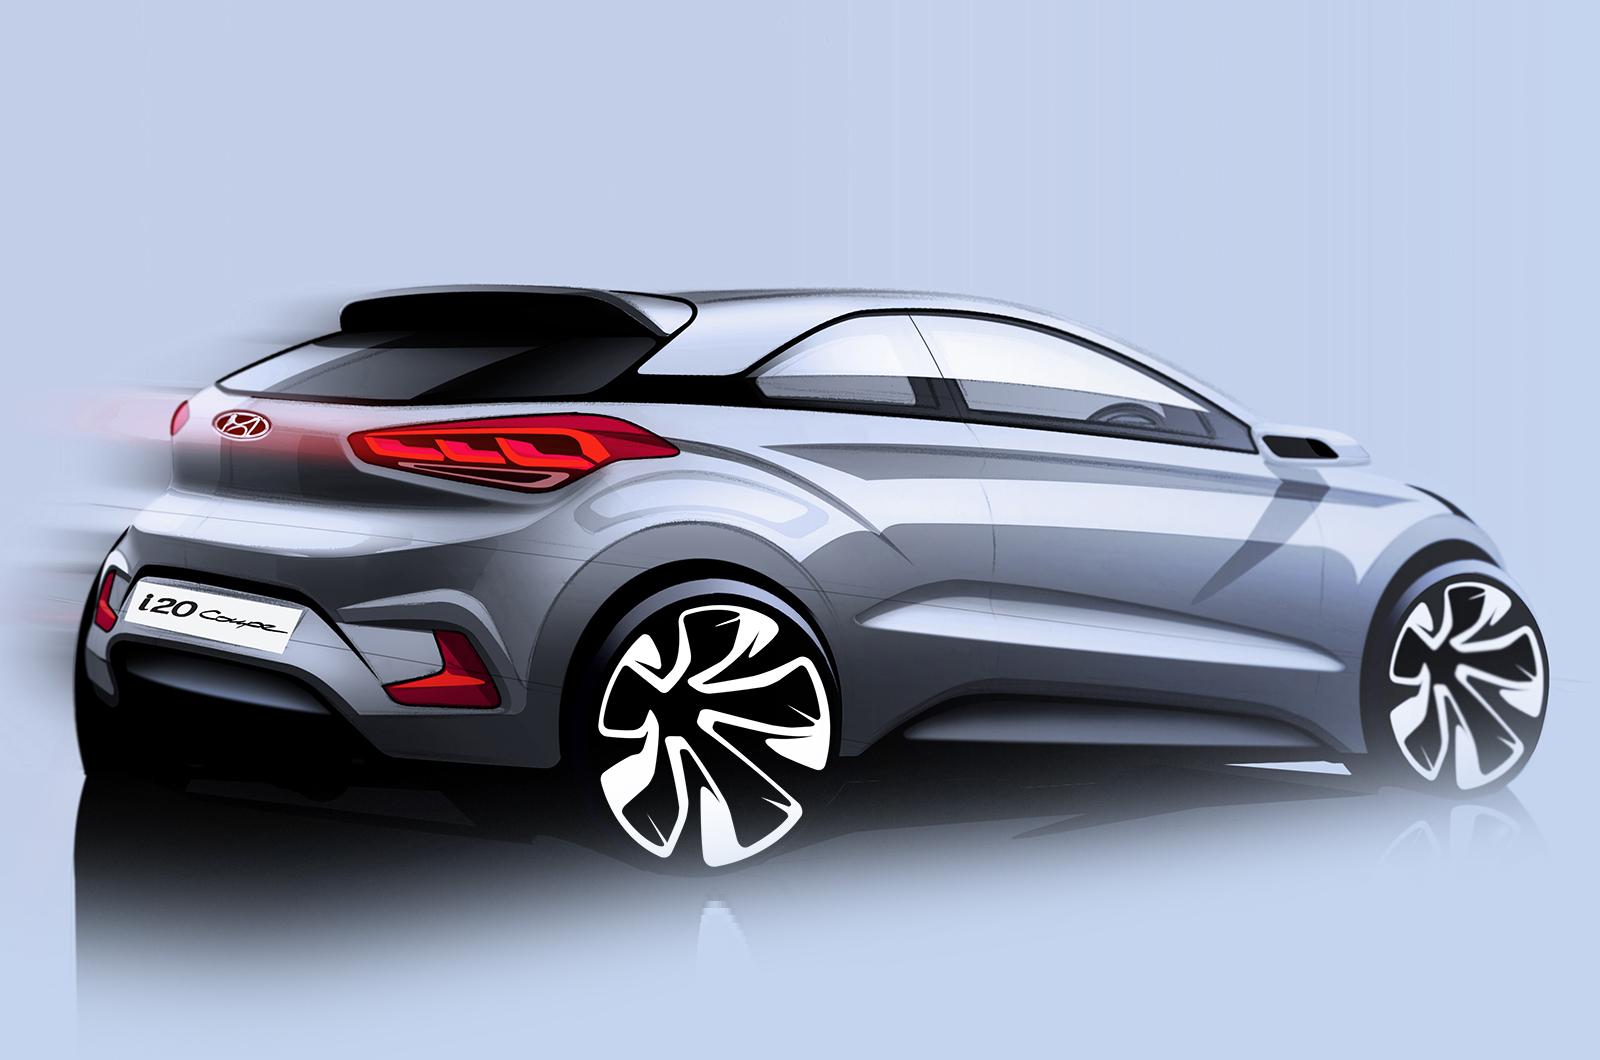 hyundai i20 coupe in works car news premium hatchbacks autocar india. Black Bedroom Furniture Sets. Home Design Ideas